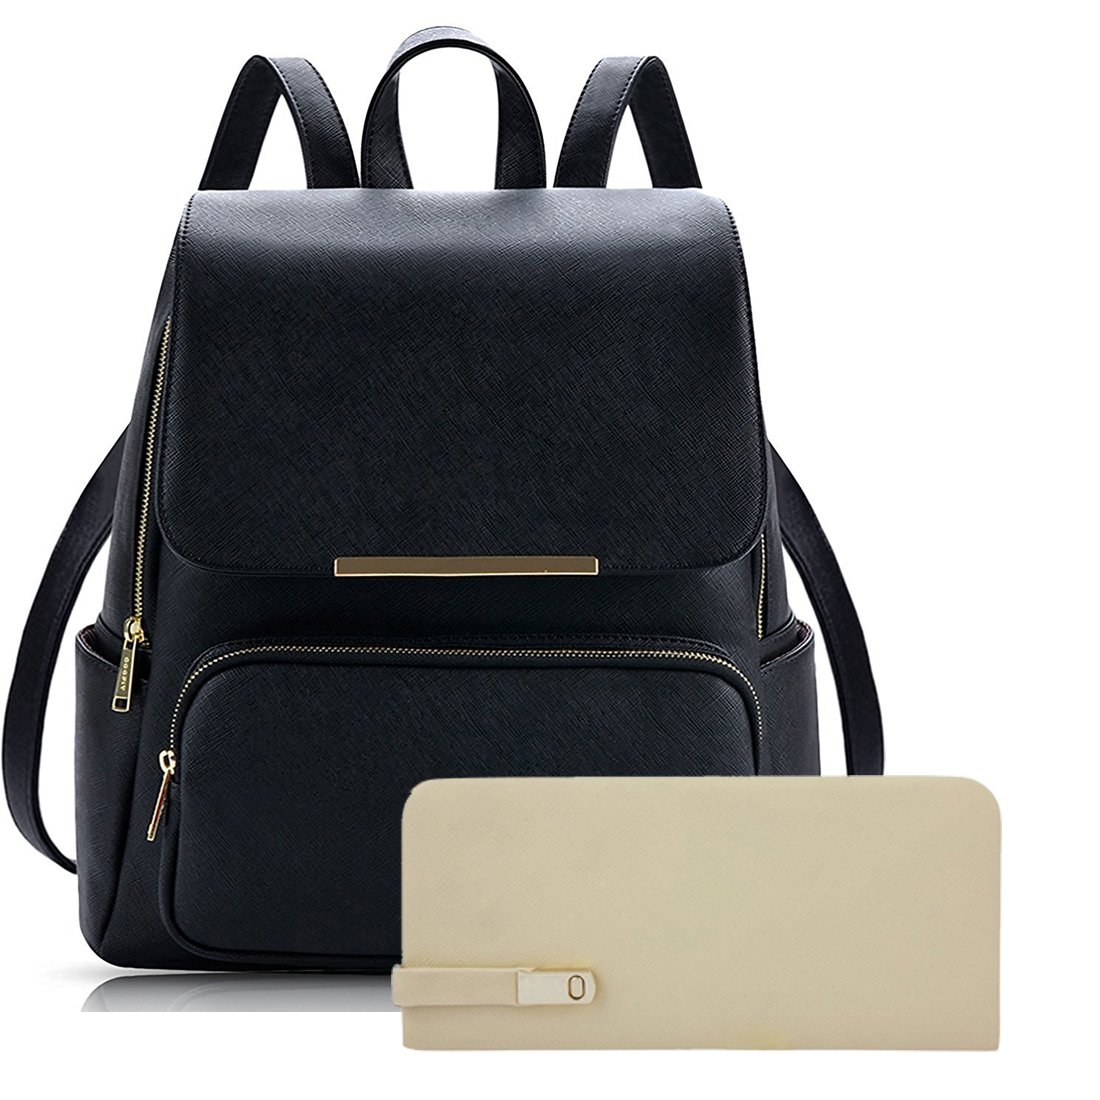 Alice Women s Backpack Handbag With Clutch Combo (Prebkp9 Clutch ) - Black   Amazon.in  Shoes   Handbags 02ad0a3ee44d8